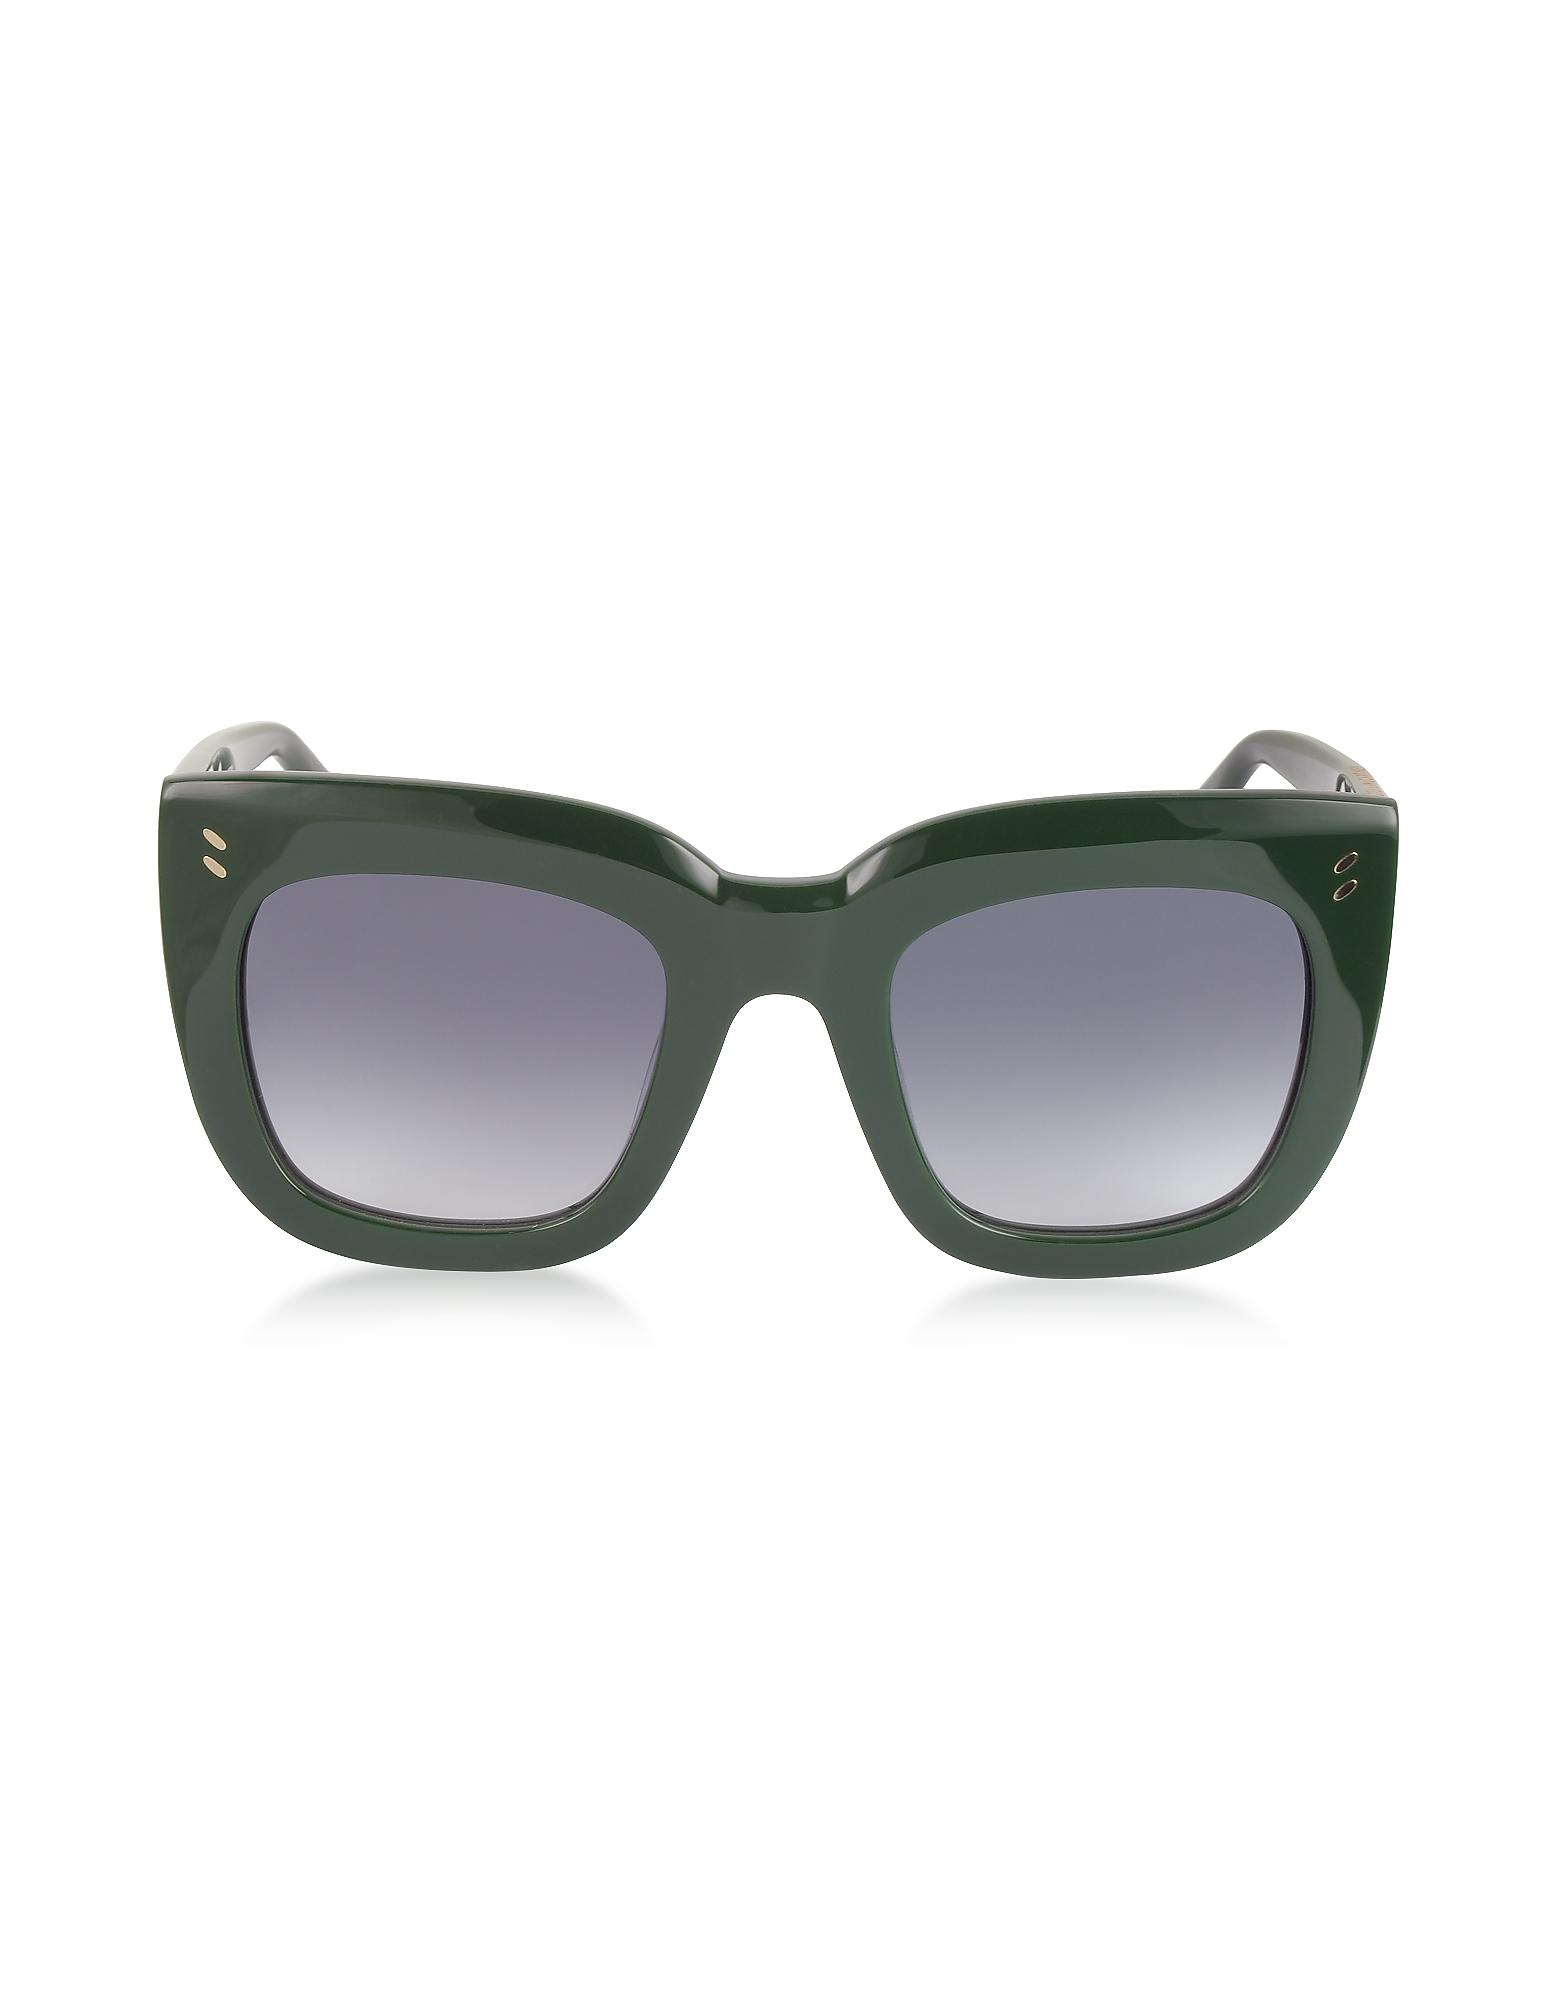 Stella McCartney Sunglasses, SC0033S Square Cat Eye Acetate Women's Sunglasses